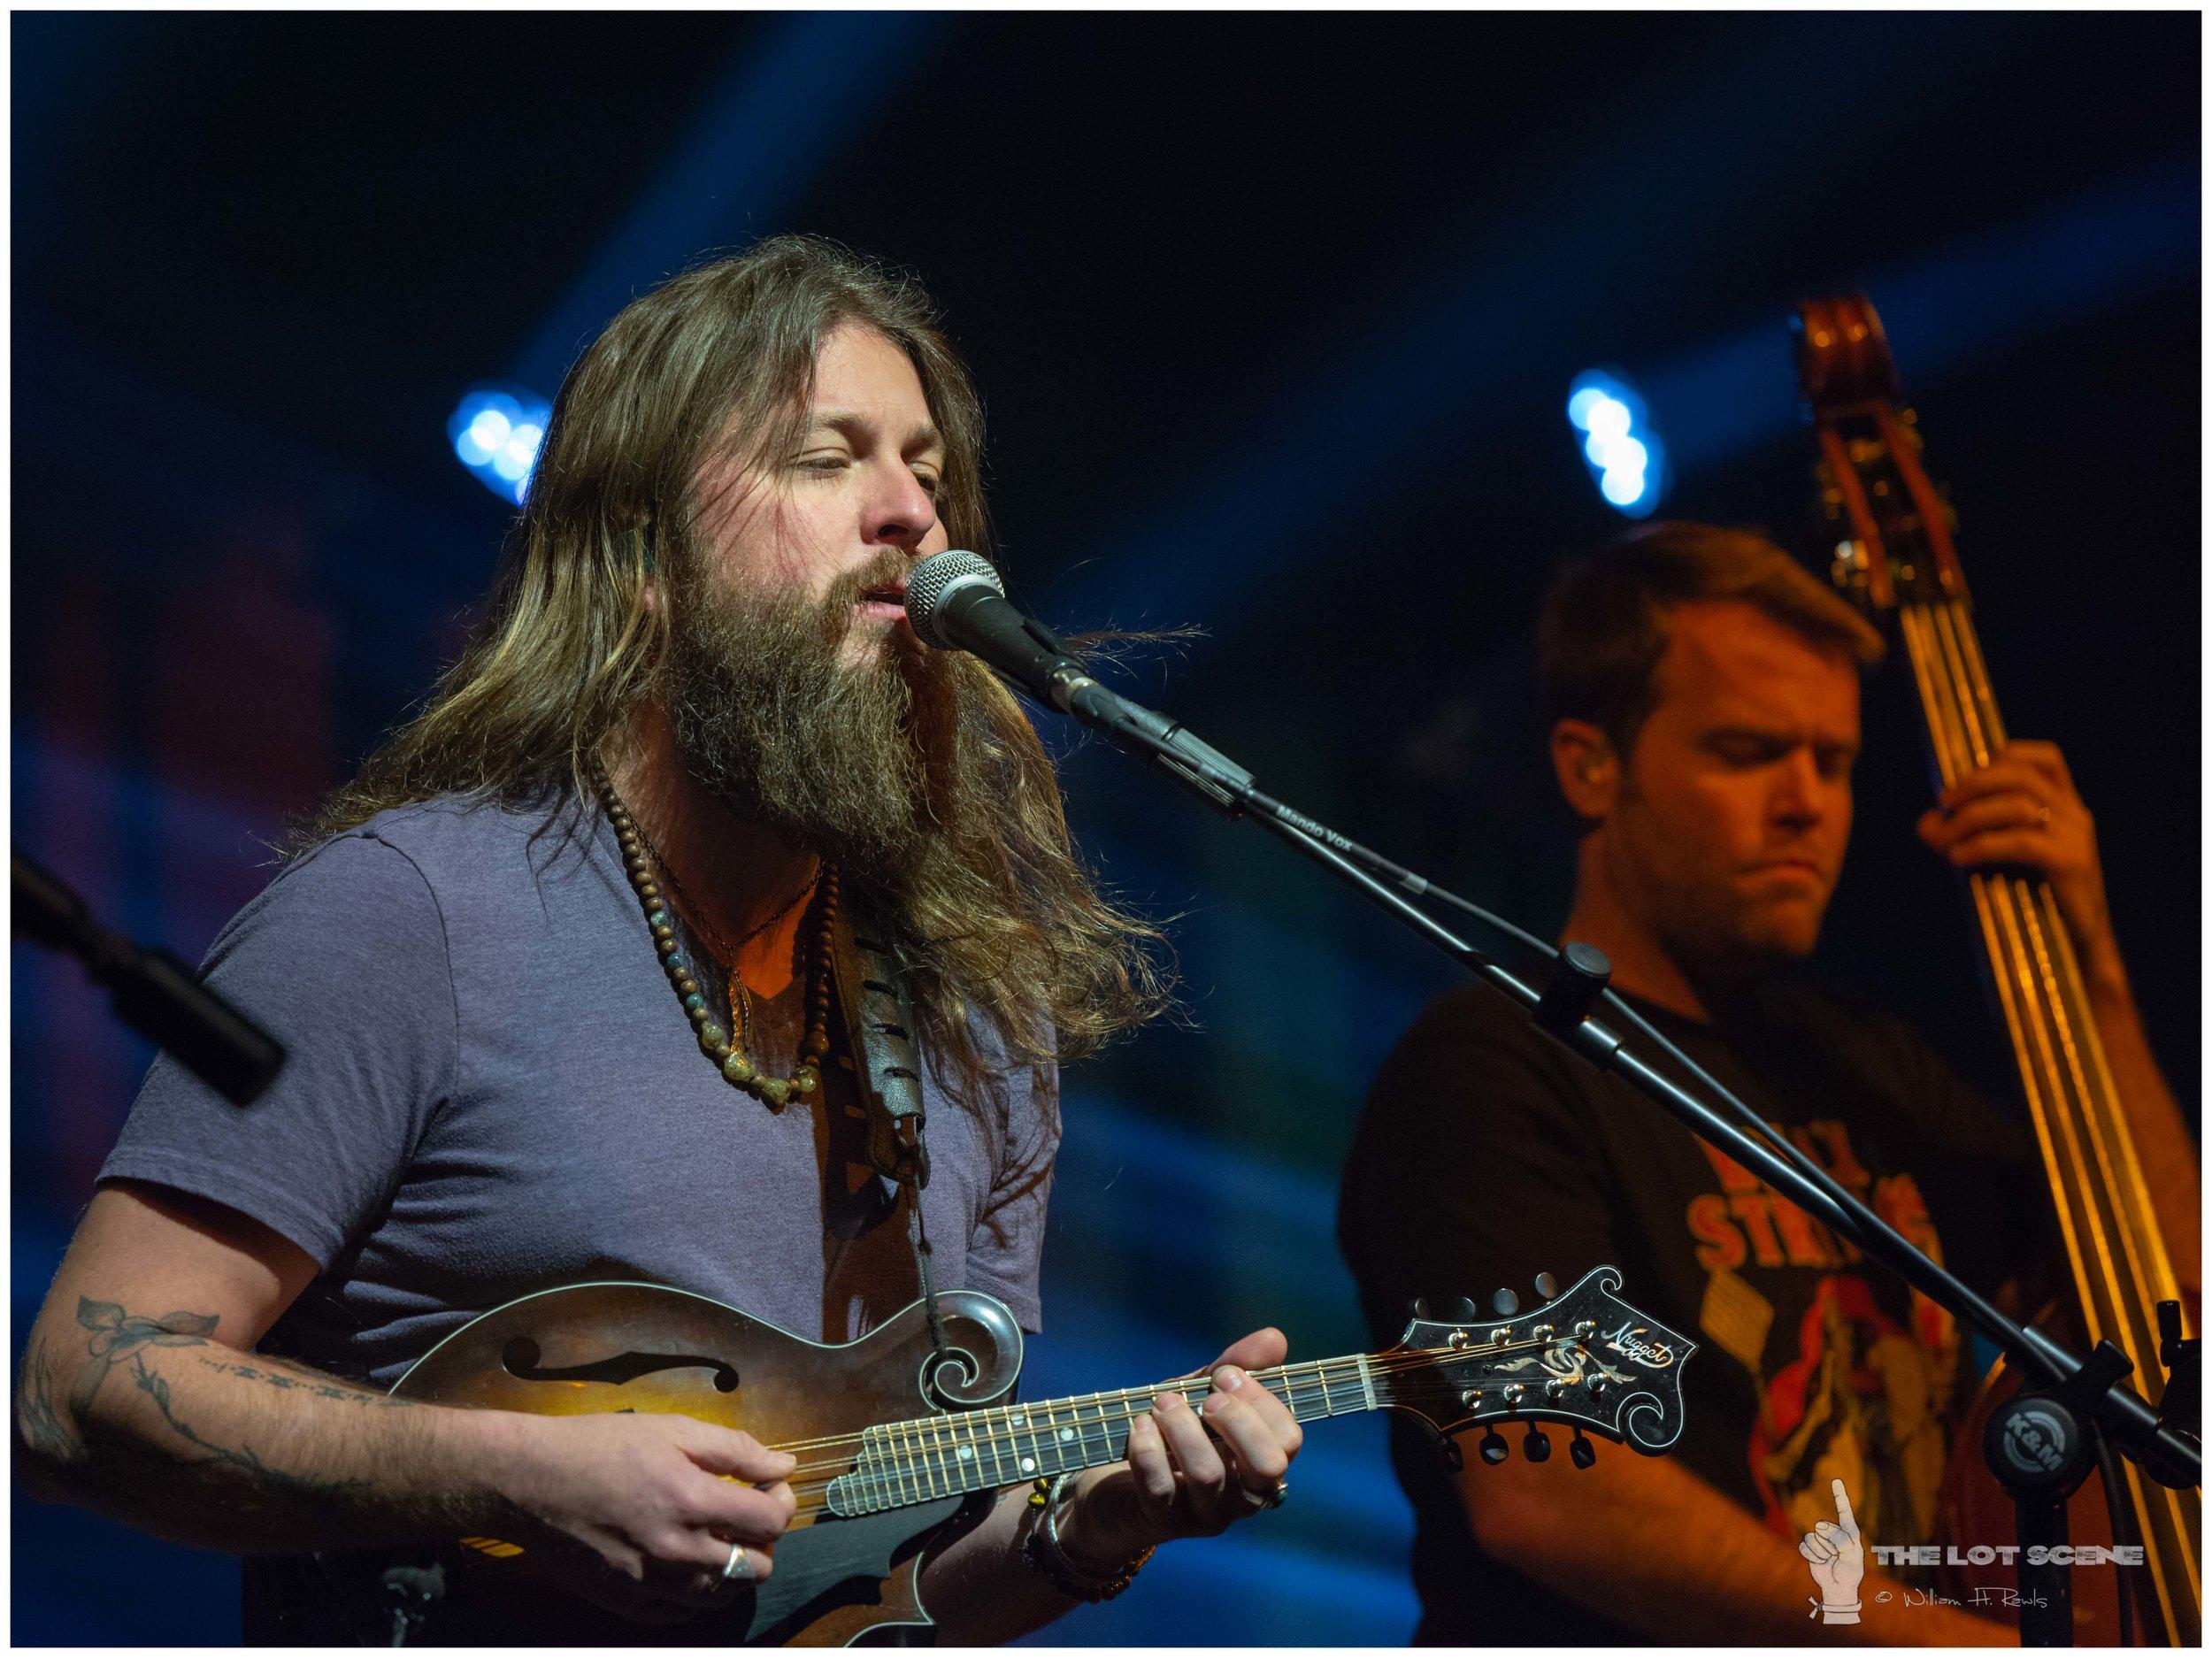 Greensky Bluegrass at The Anthem DC - February 2 2019 - 1.jpg